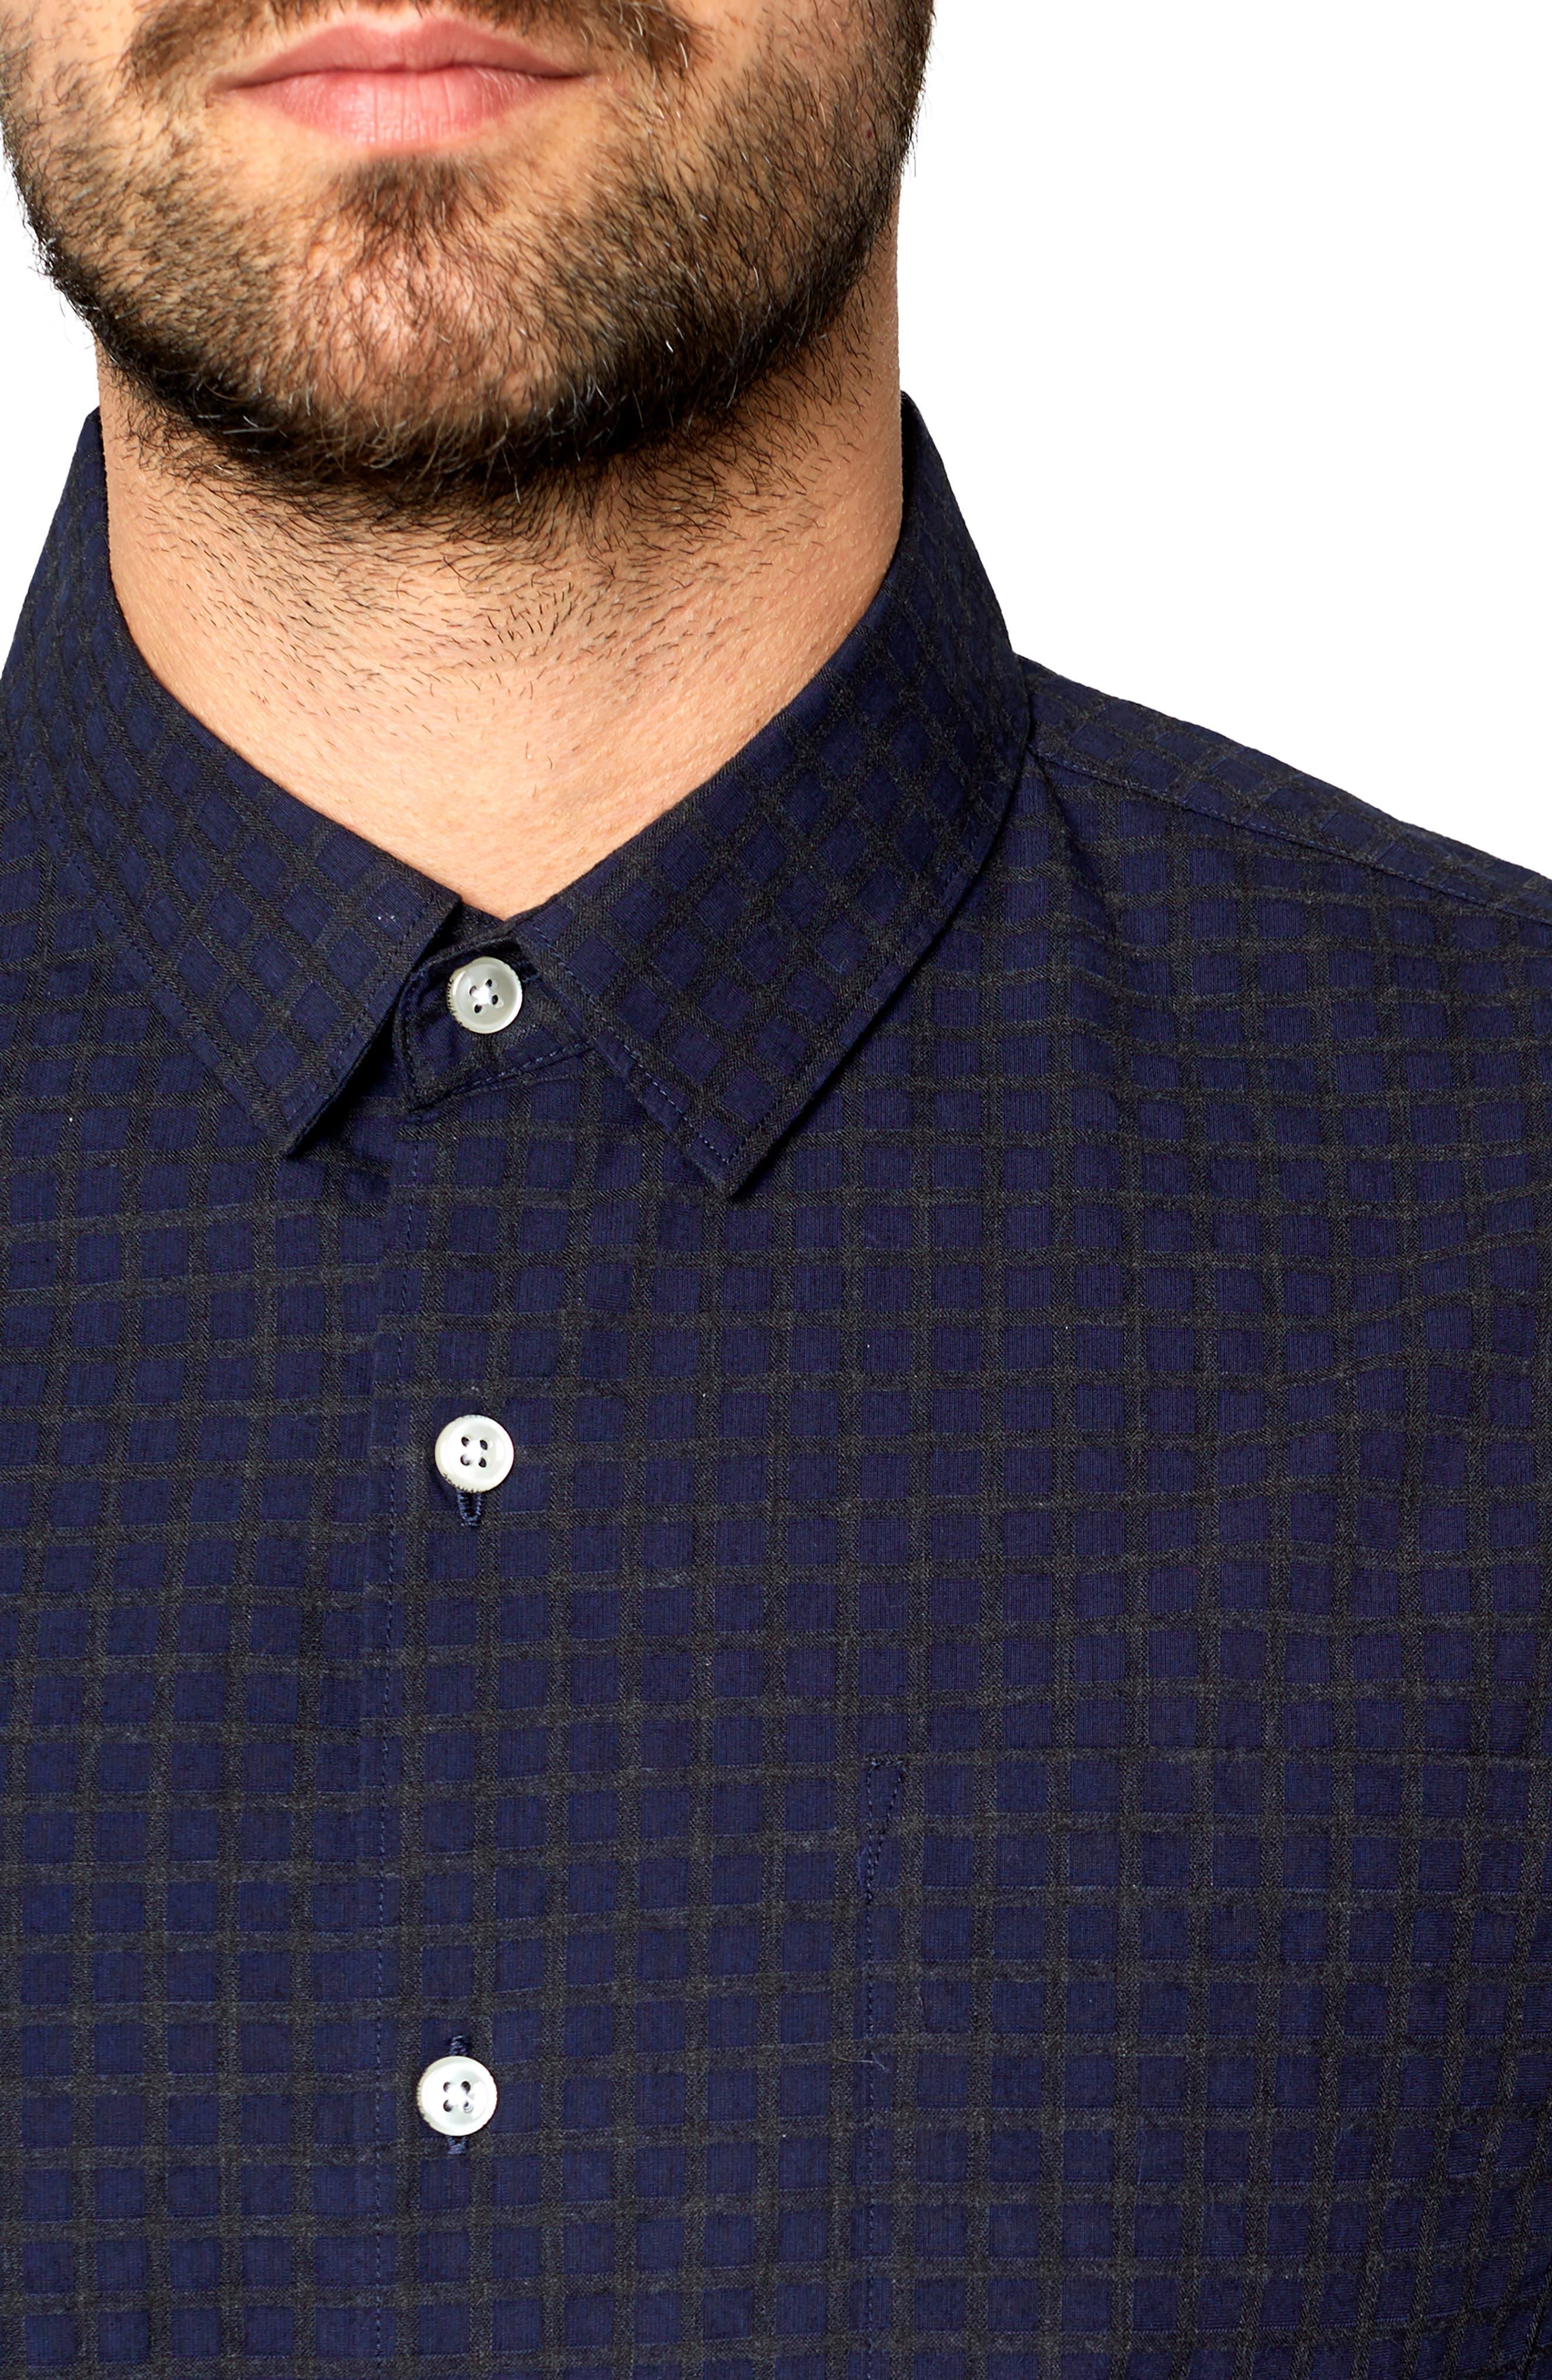 Players Club Trim Fit Linen Blend Sport Shirt,                             Alternate thumbnail 2, color,                             MIDNIGHT